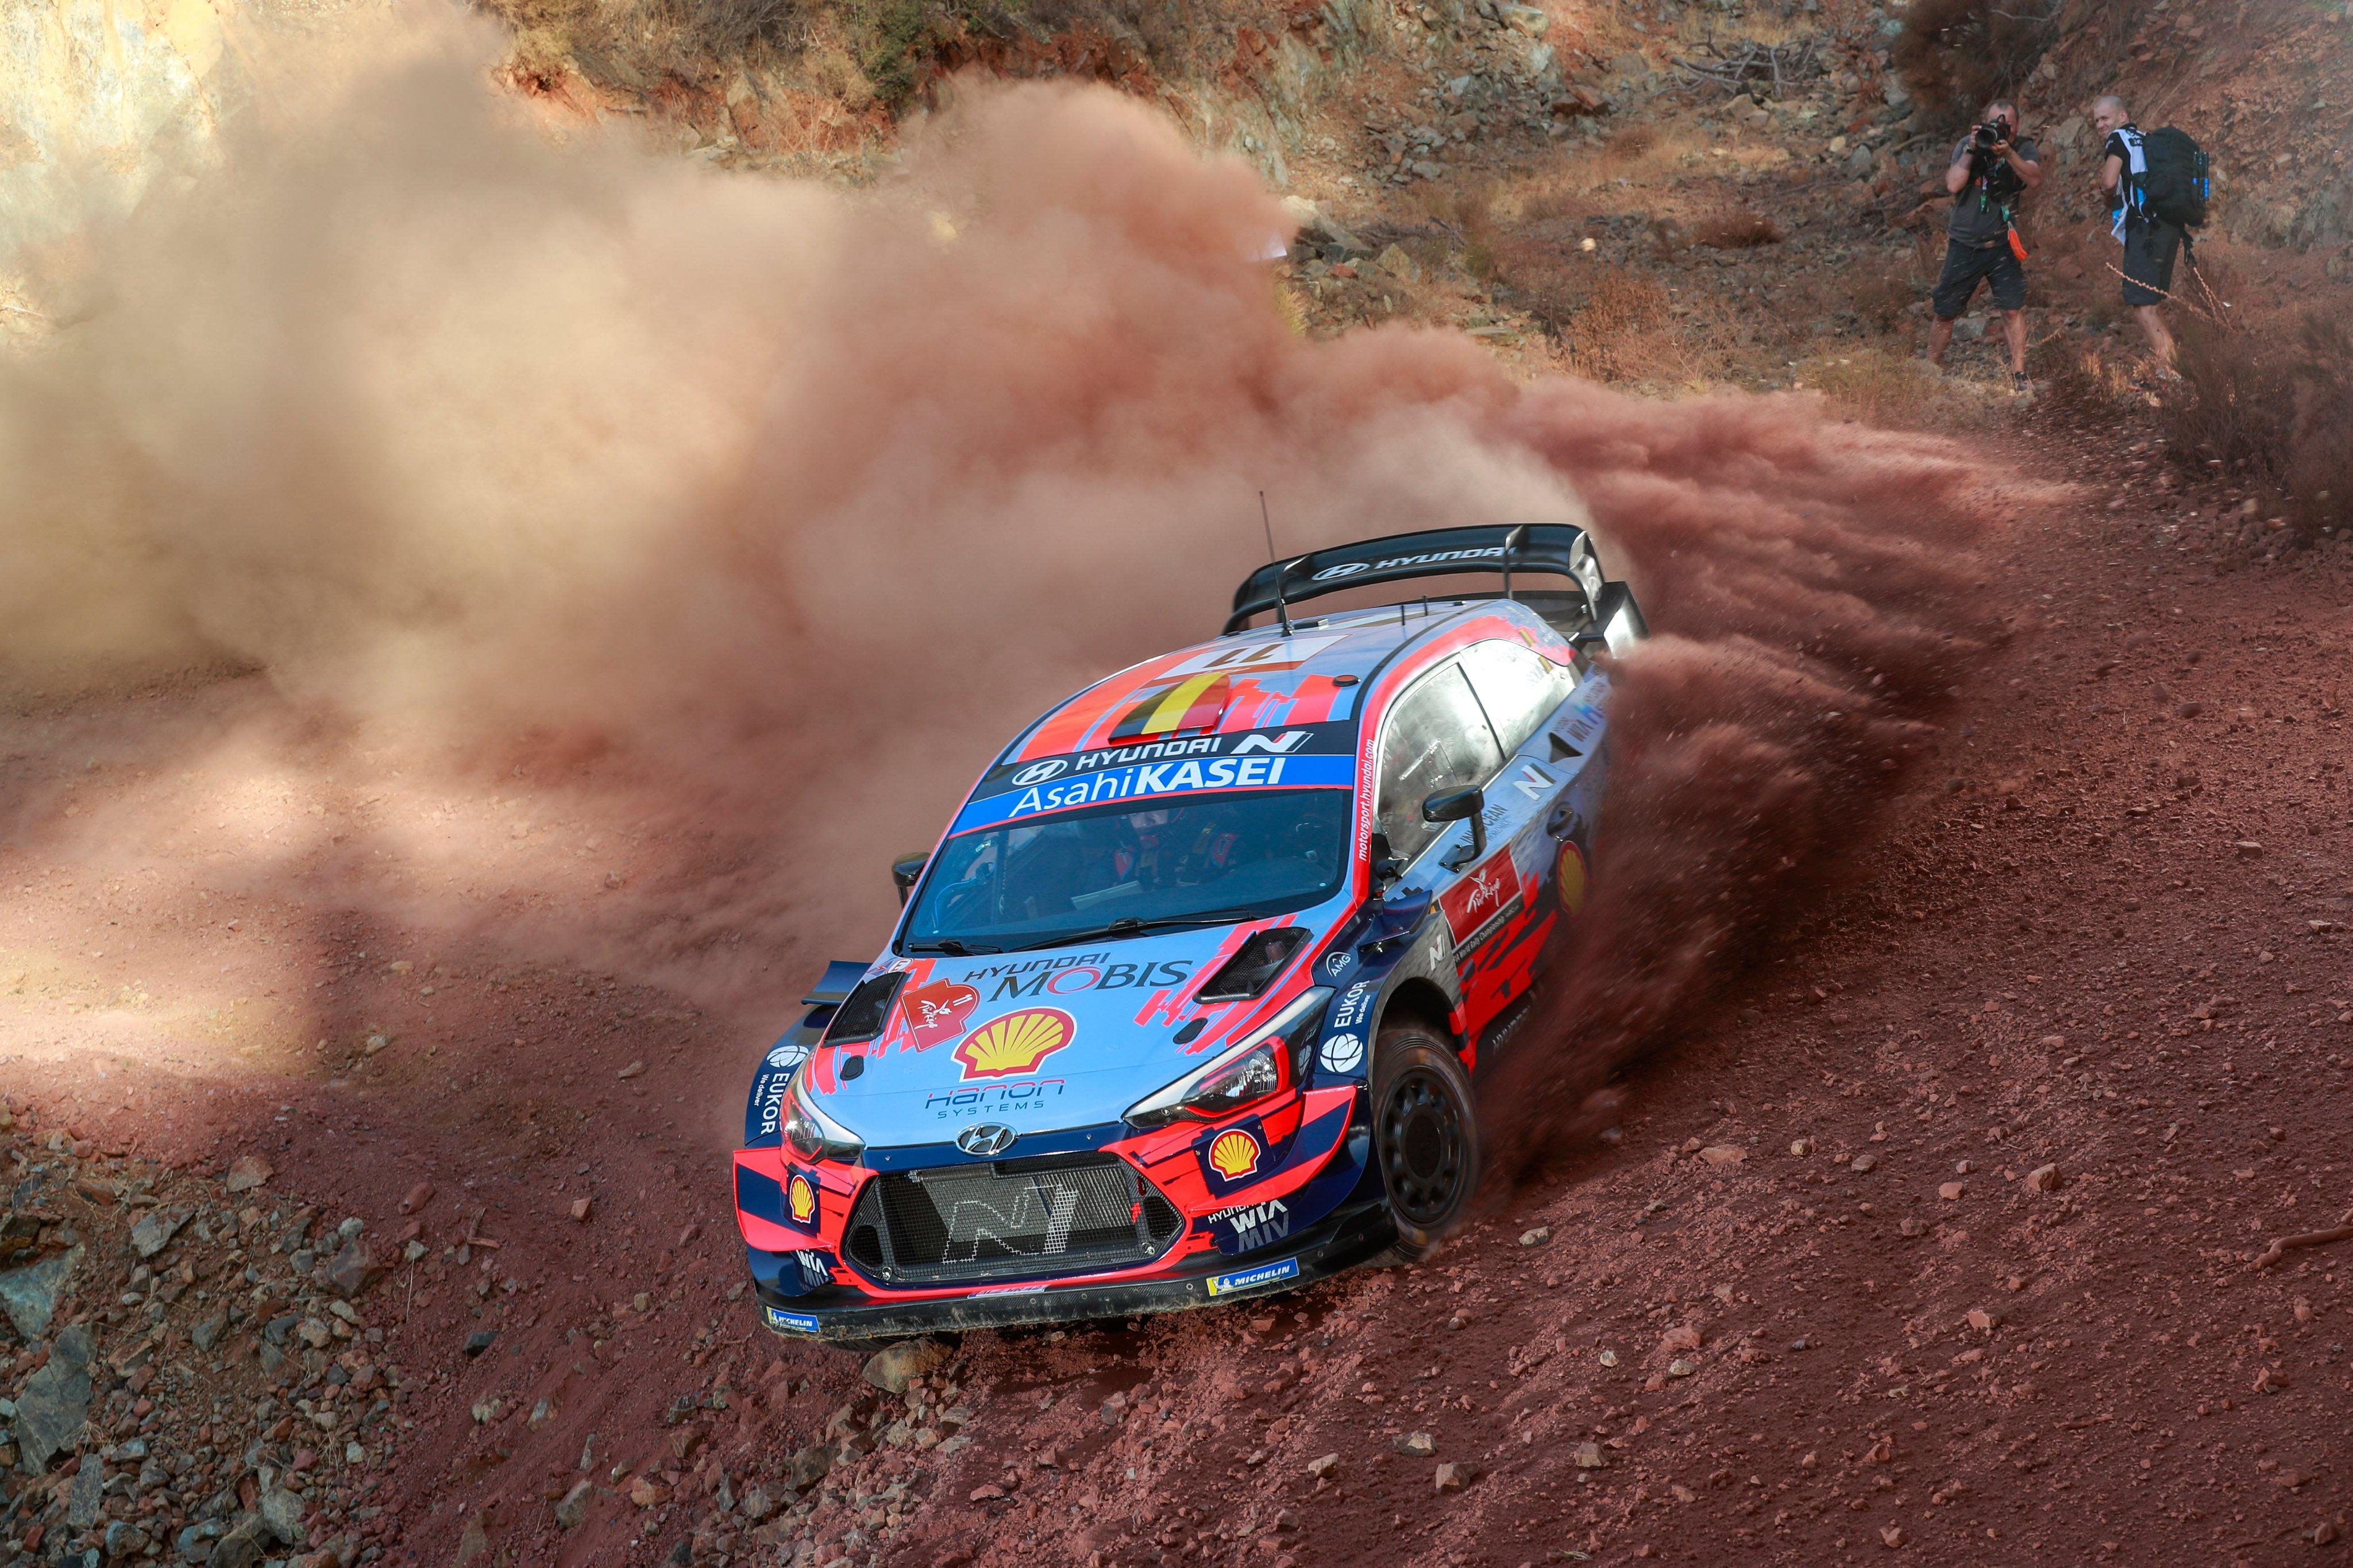 WRC: Marmaris Rally Turkey [18-20 Septiembre] - Página 2 EiL70GHXsAI5Wuw?format=jpg&name=4096x4096